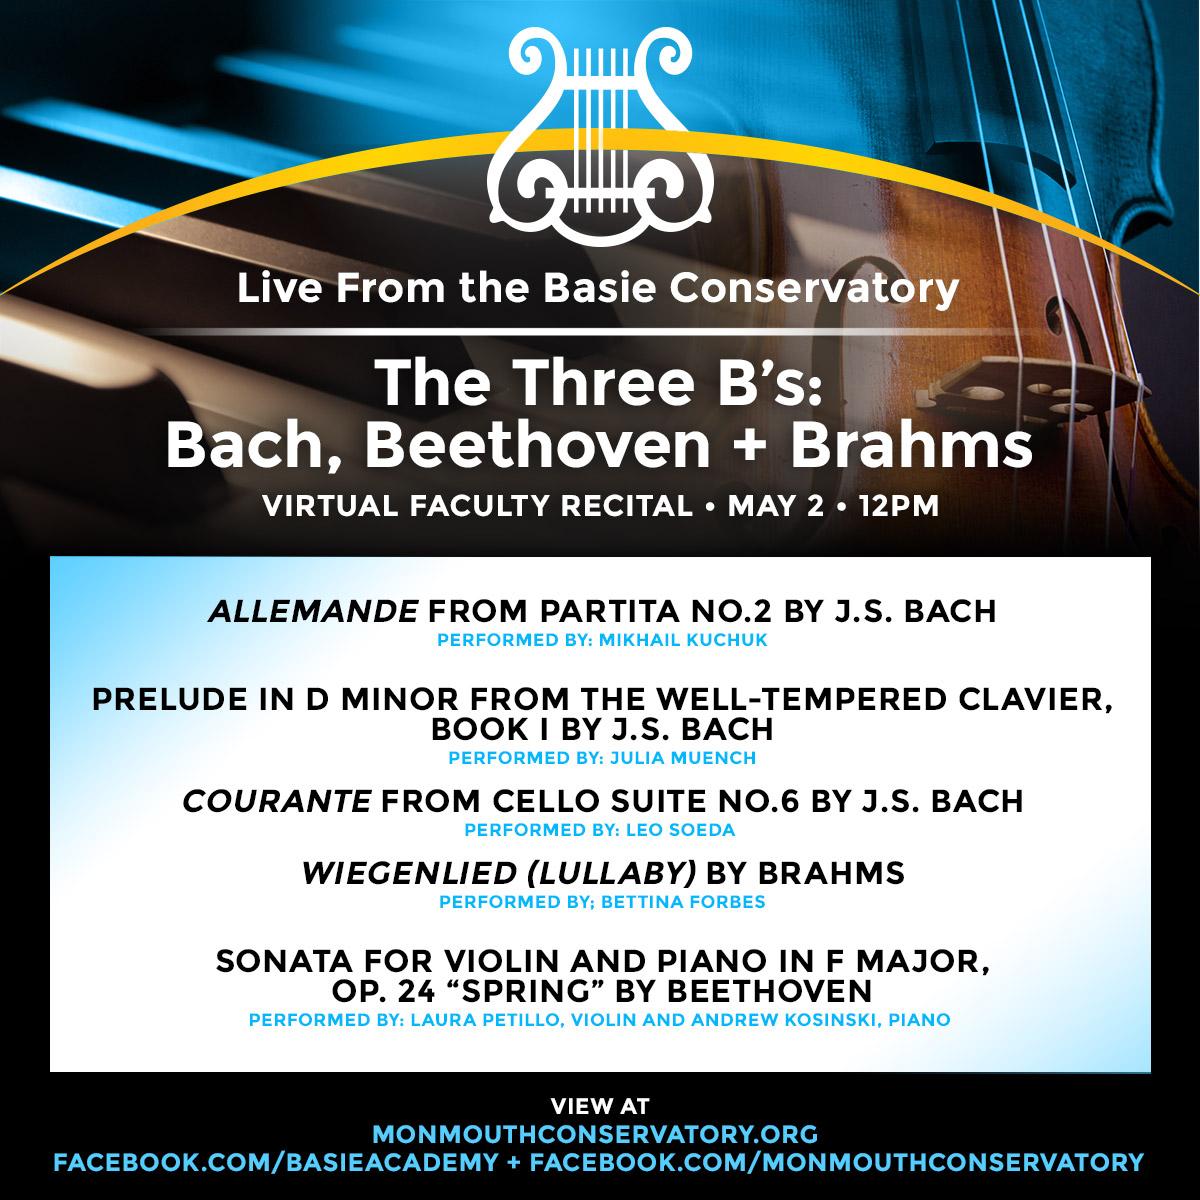 Virtual Conservatory Faculty Recital: The Three B's